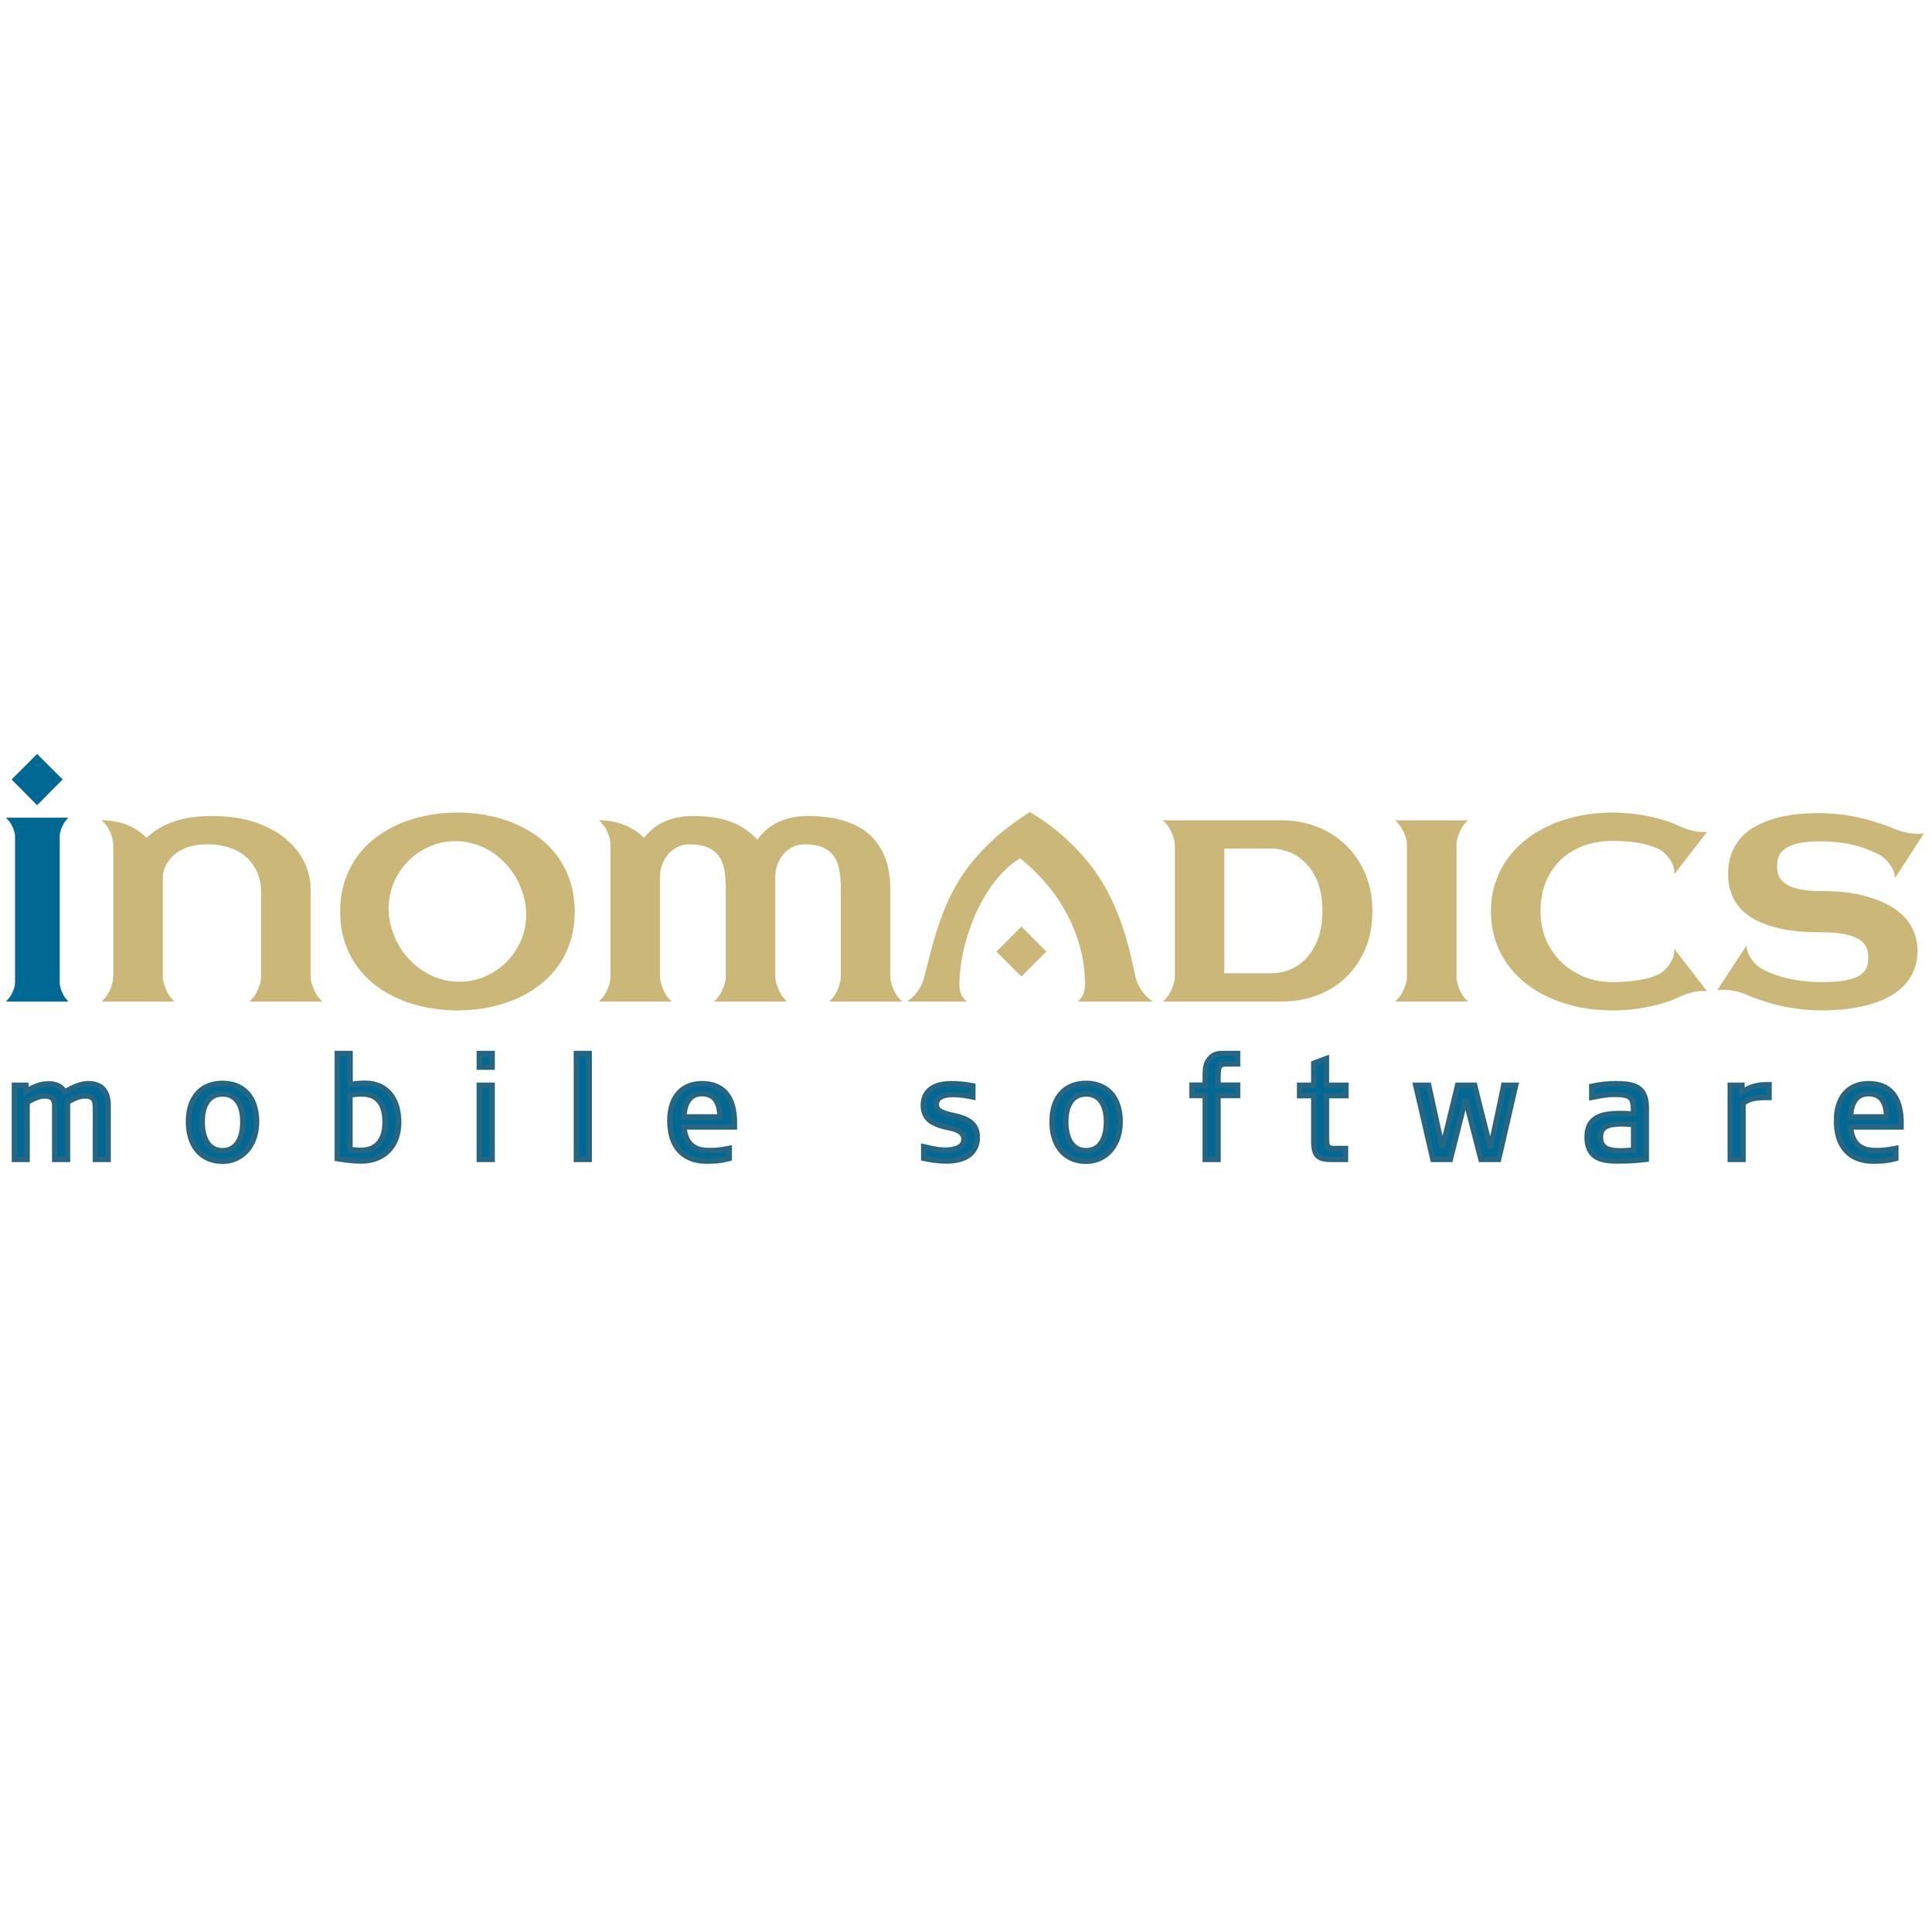 MDD_logos_uniform-16.png